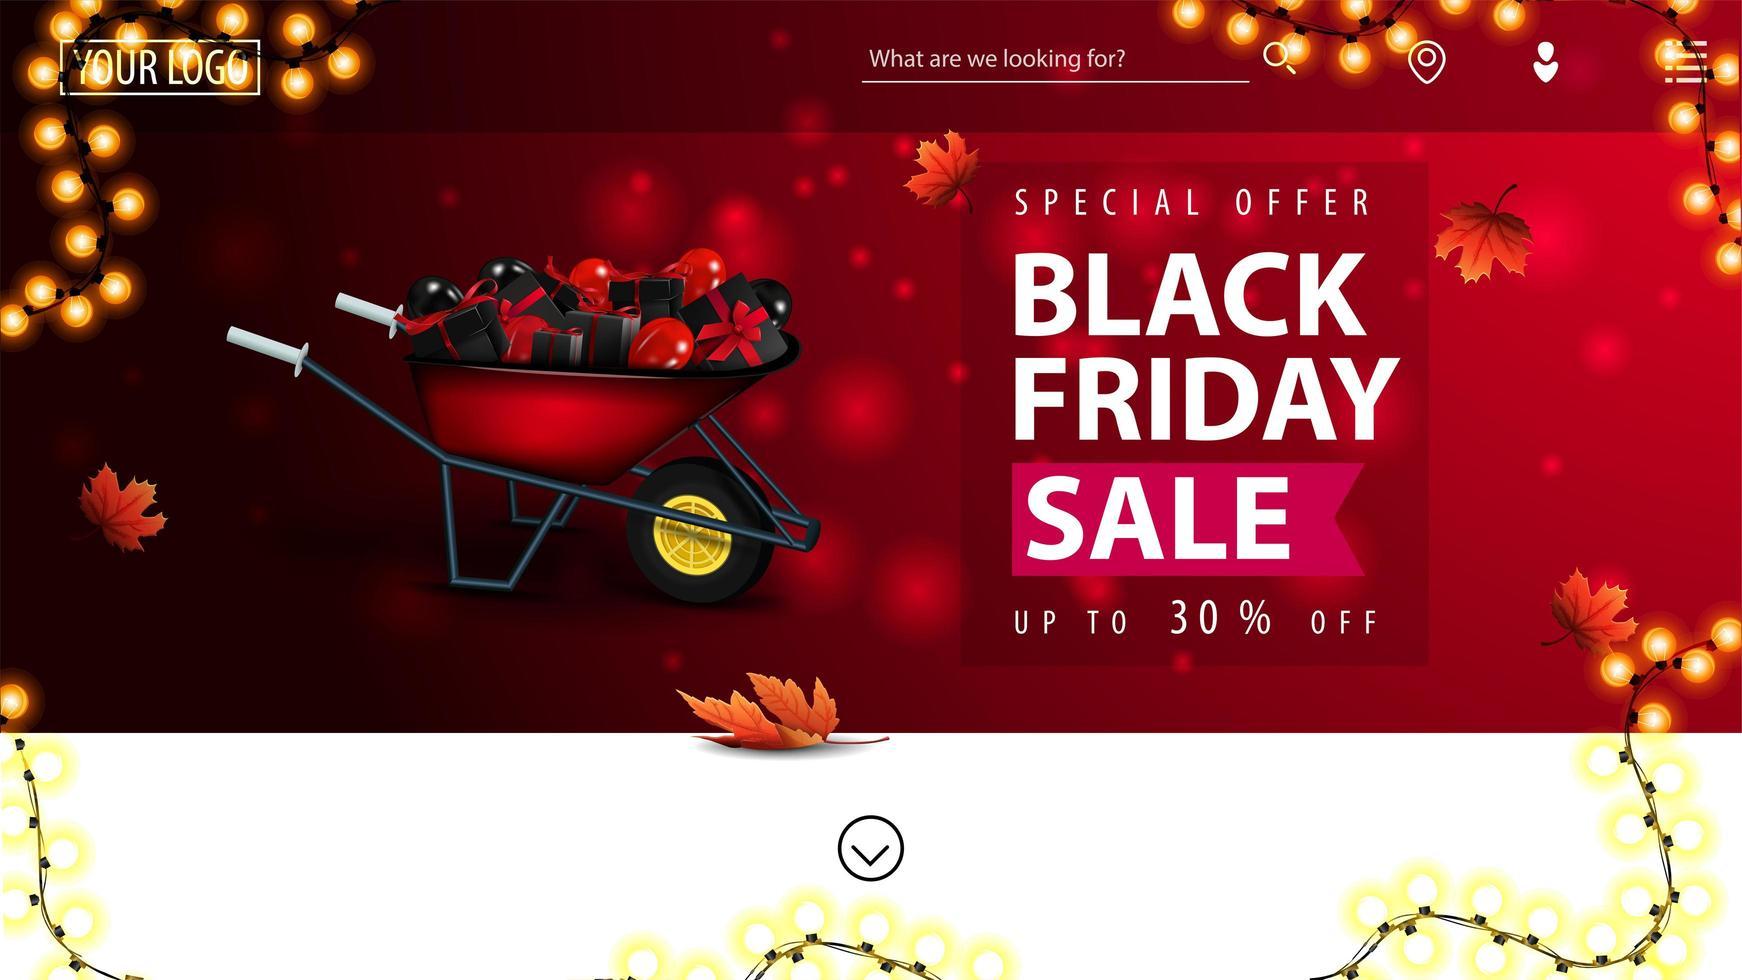 Special offer, Black Friday Sale banner vector